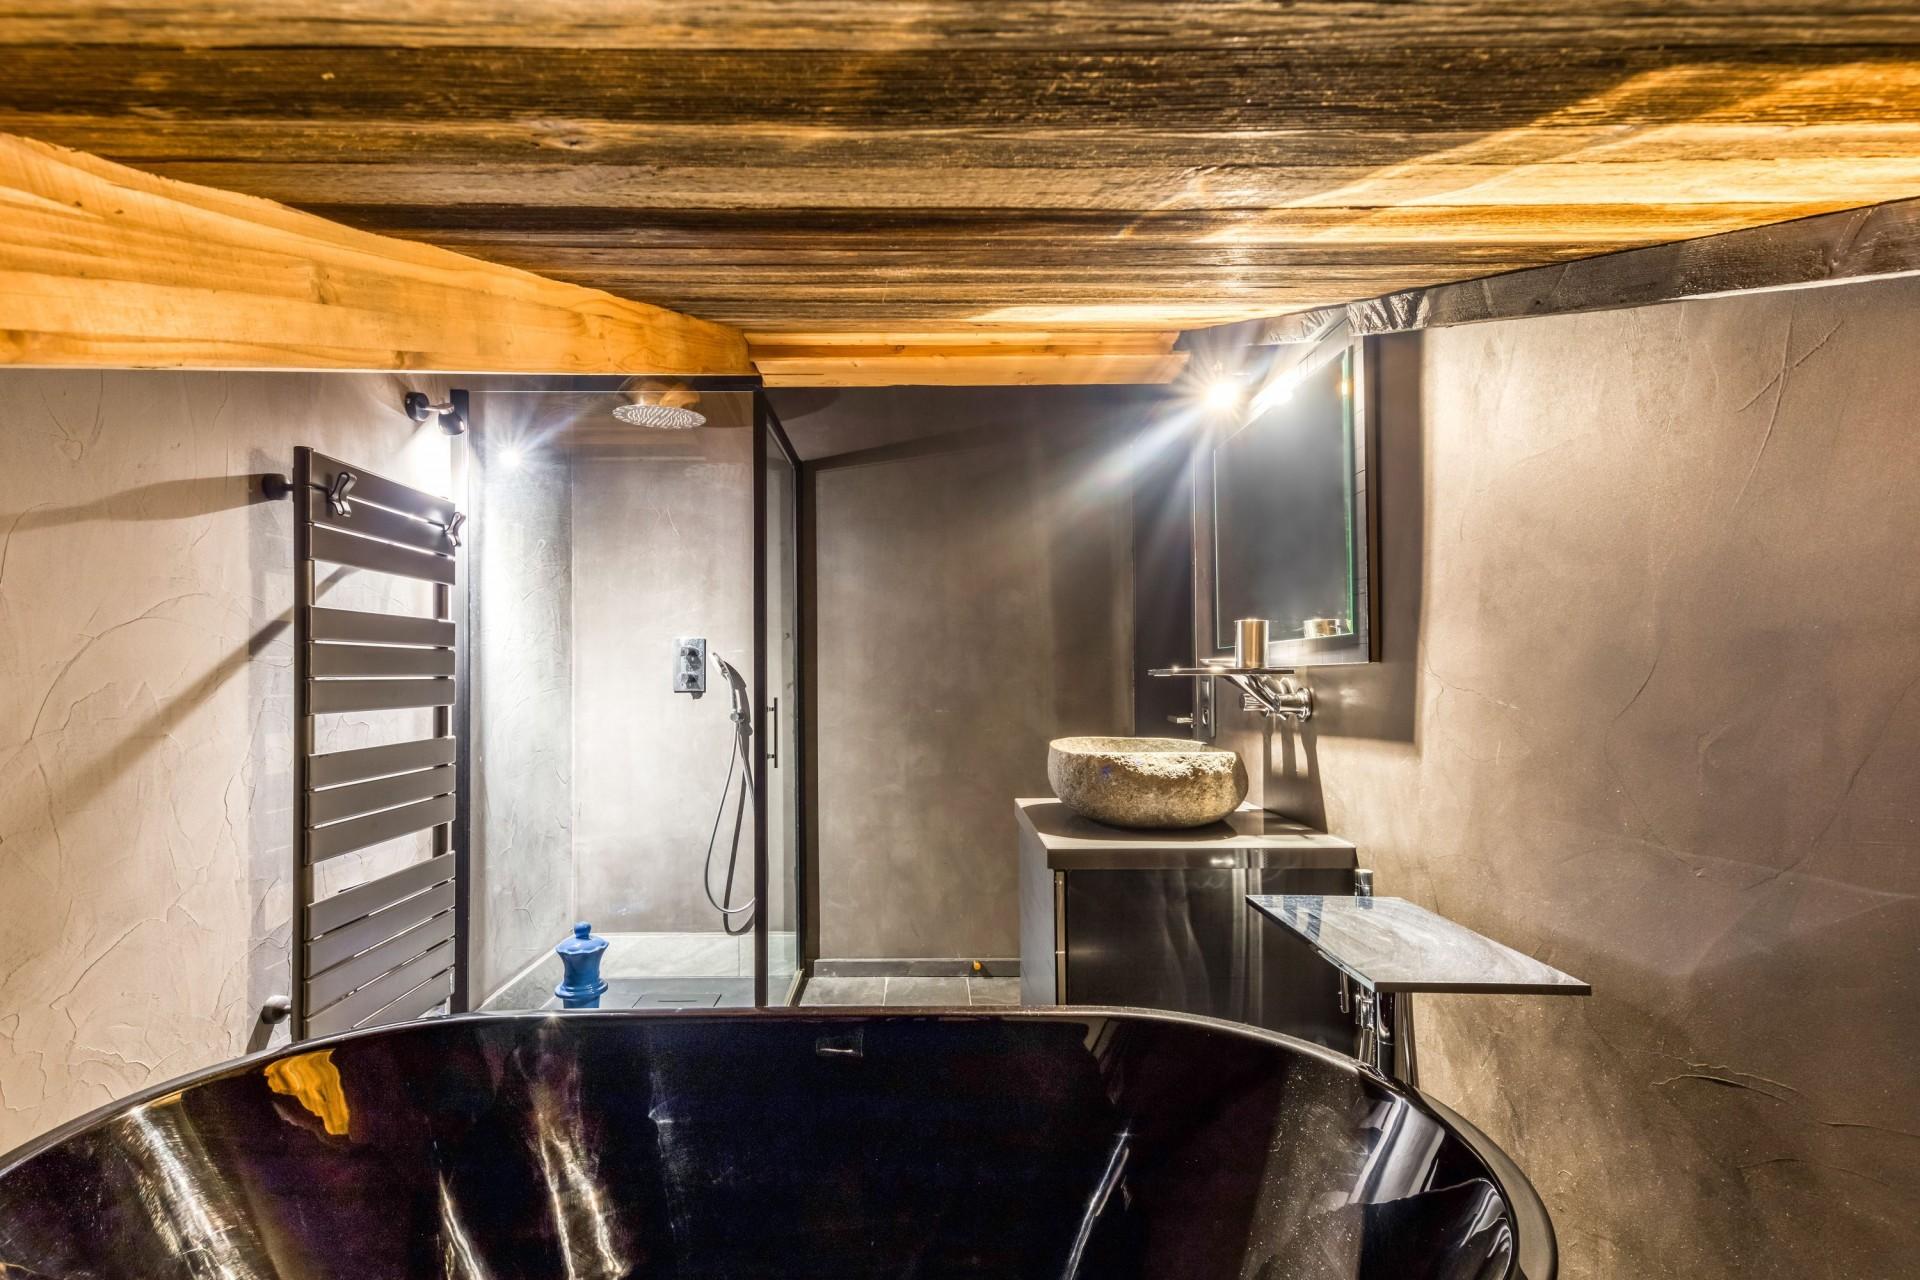 Tignes Location Chalet Luxe Tavanite Salle De Bain3